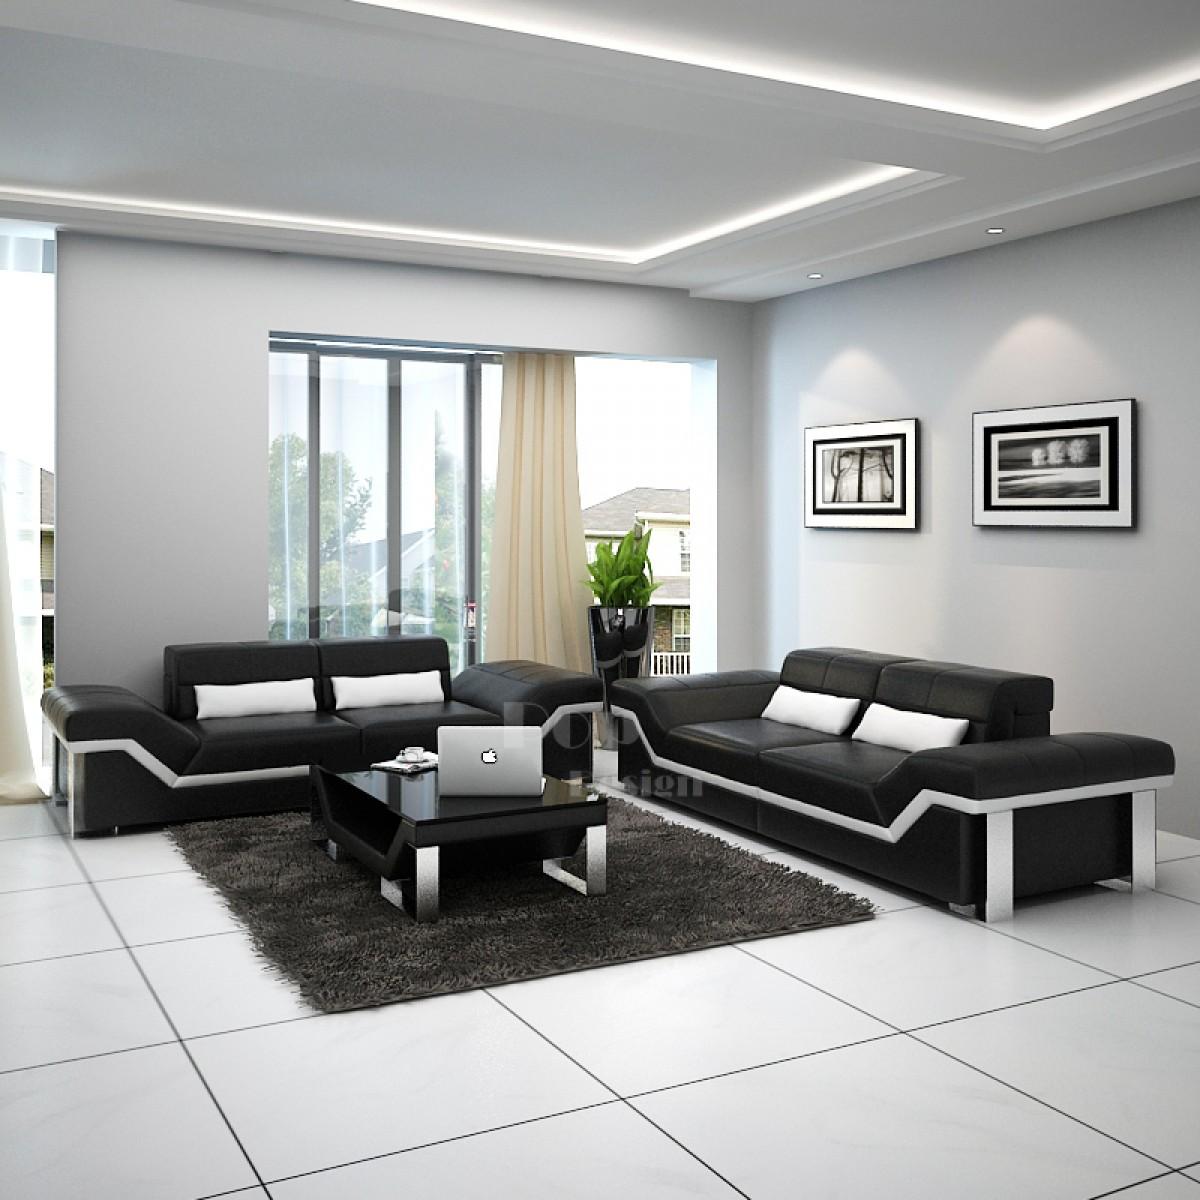 Salon set de canap s design 3 3 torino en cuir pop for Set de salon liquidation